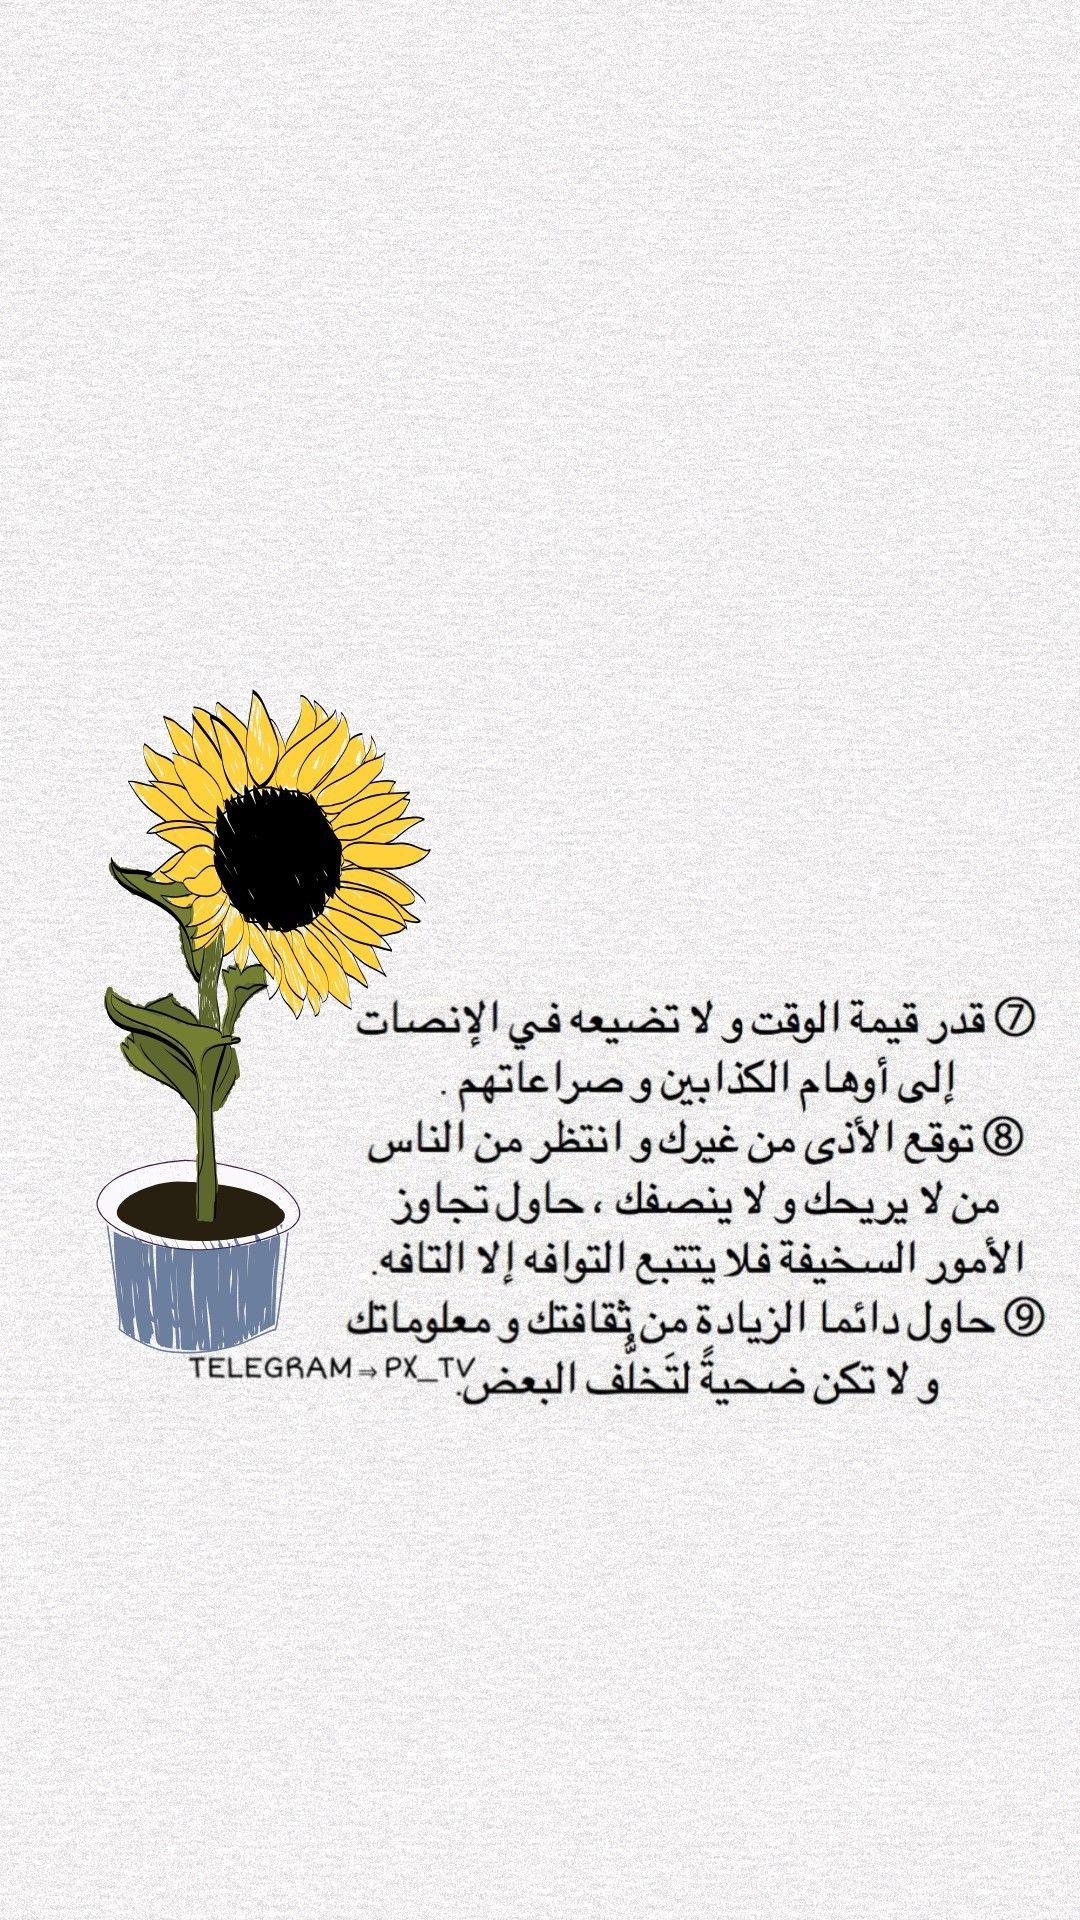 تابعوا قناتنه ع تلكرام Px Tv افكار ستوريات منوعات برامج سنابات افلام كبلات Best Quran Quotes Quran Quotes Life Skills